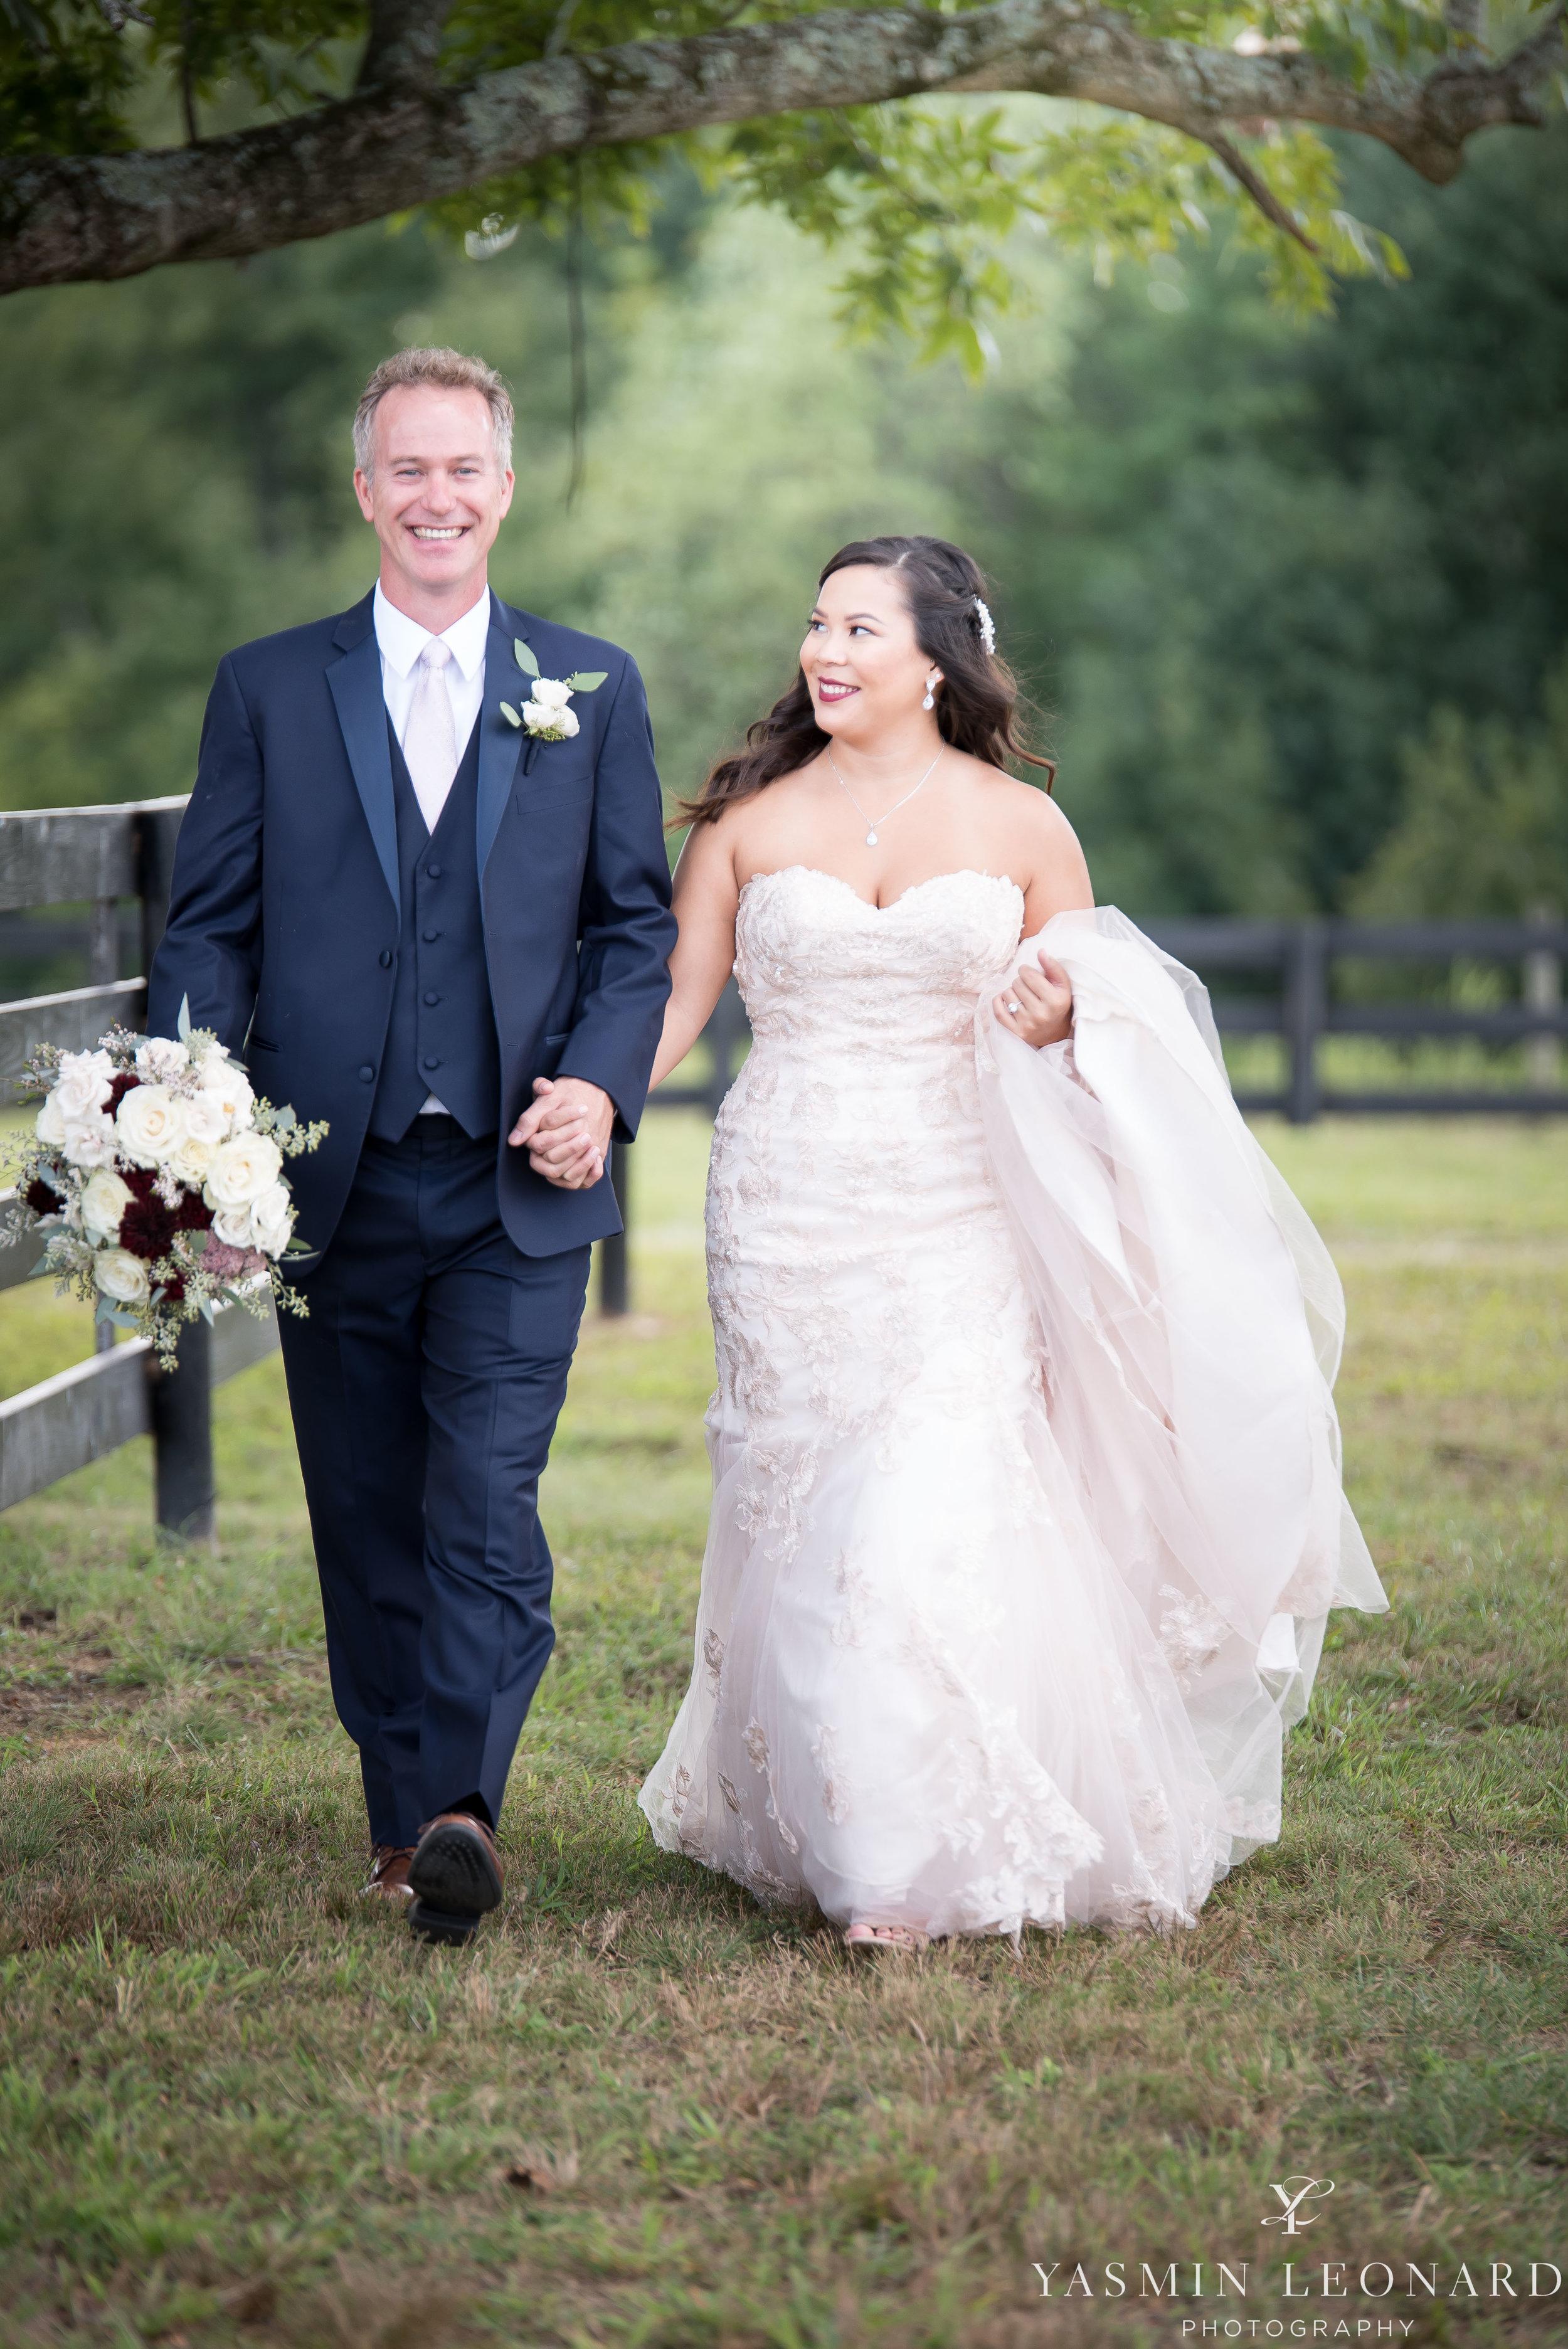 Mason Ridge   Liberty, NC   Aylissa and John   Yasmin Leonard Photography-46.jpg